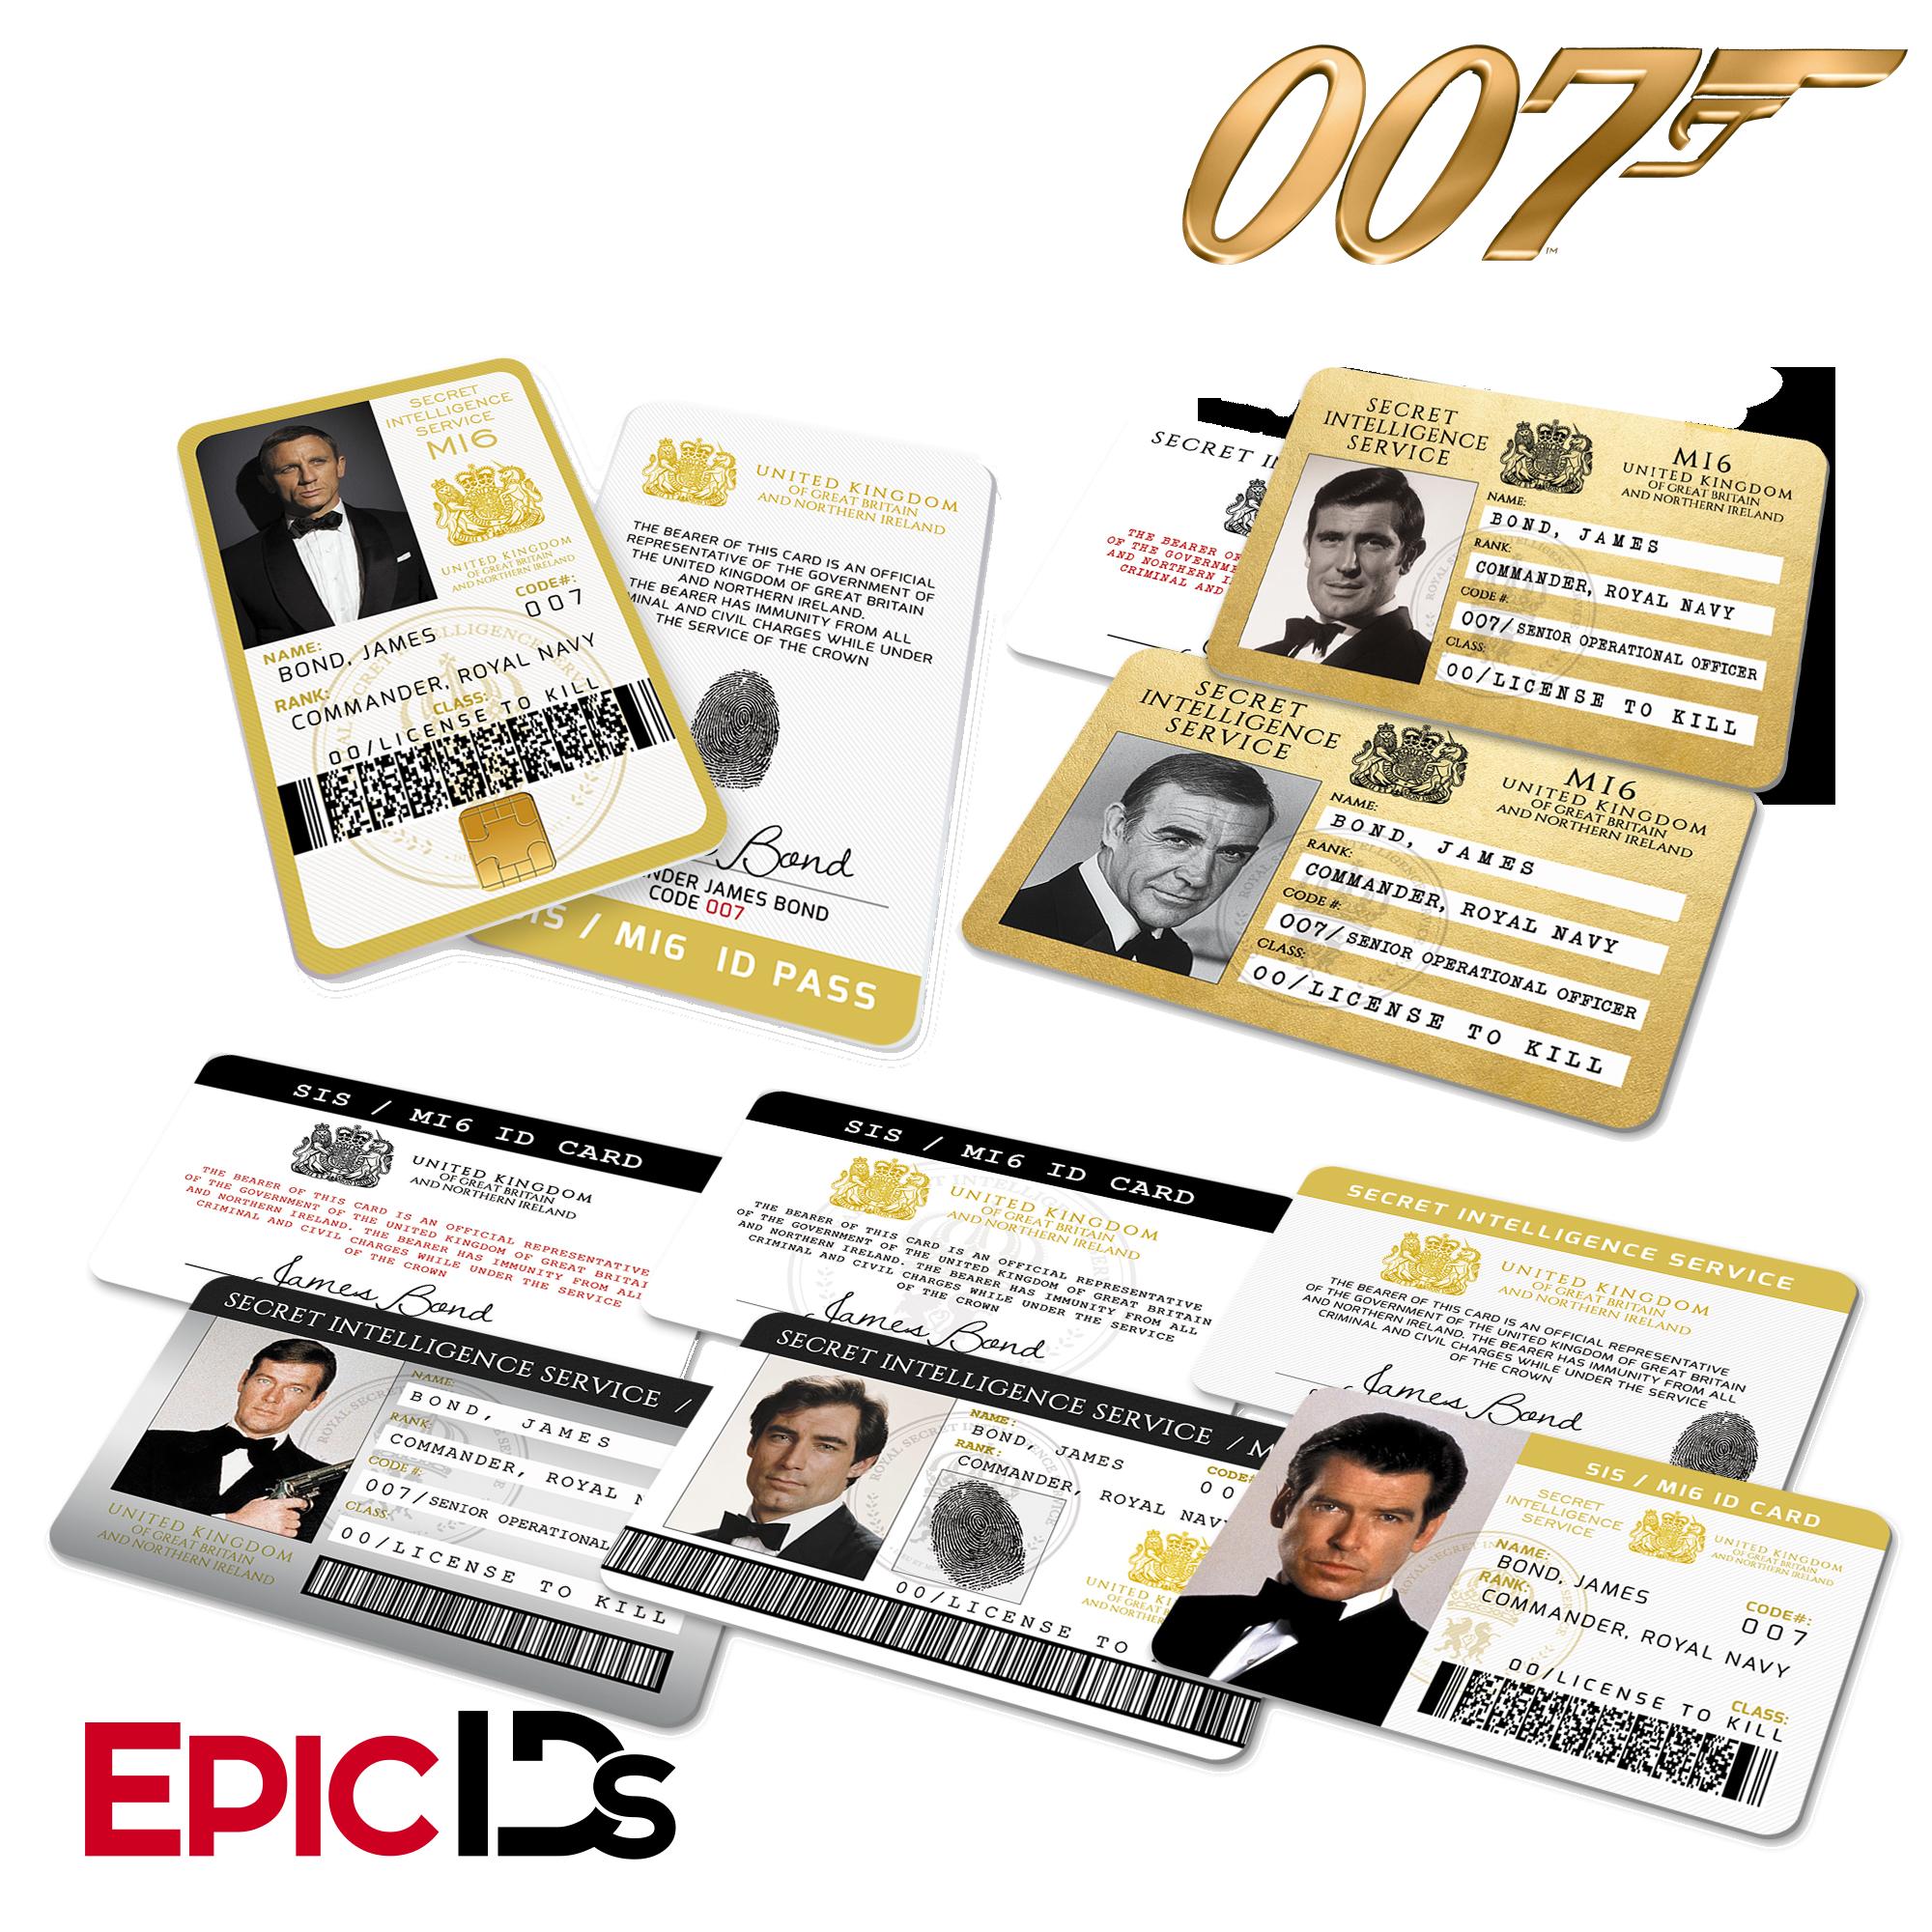 James Bond 007 Inspired Secret Intelligence Service Id Complete Collection James Bond Party James Bond Theme Party New James Bond